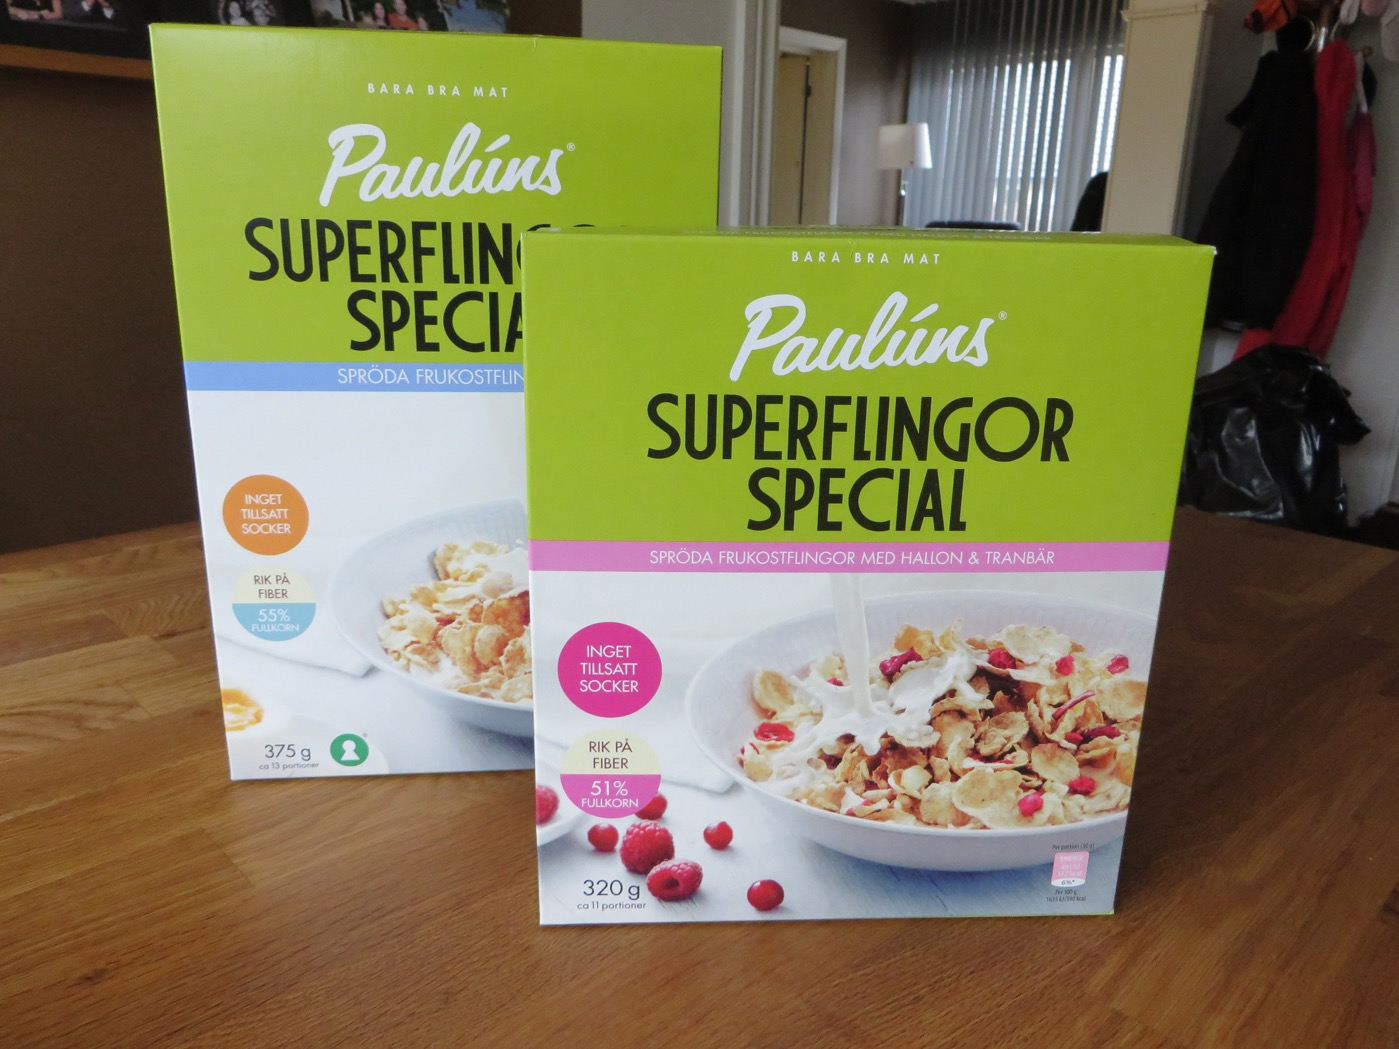 pauluns superflingor special